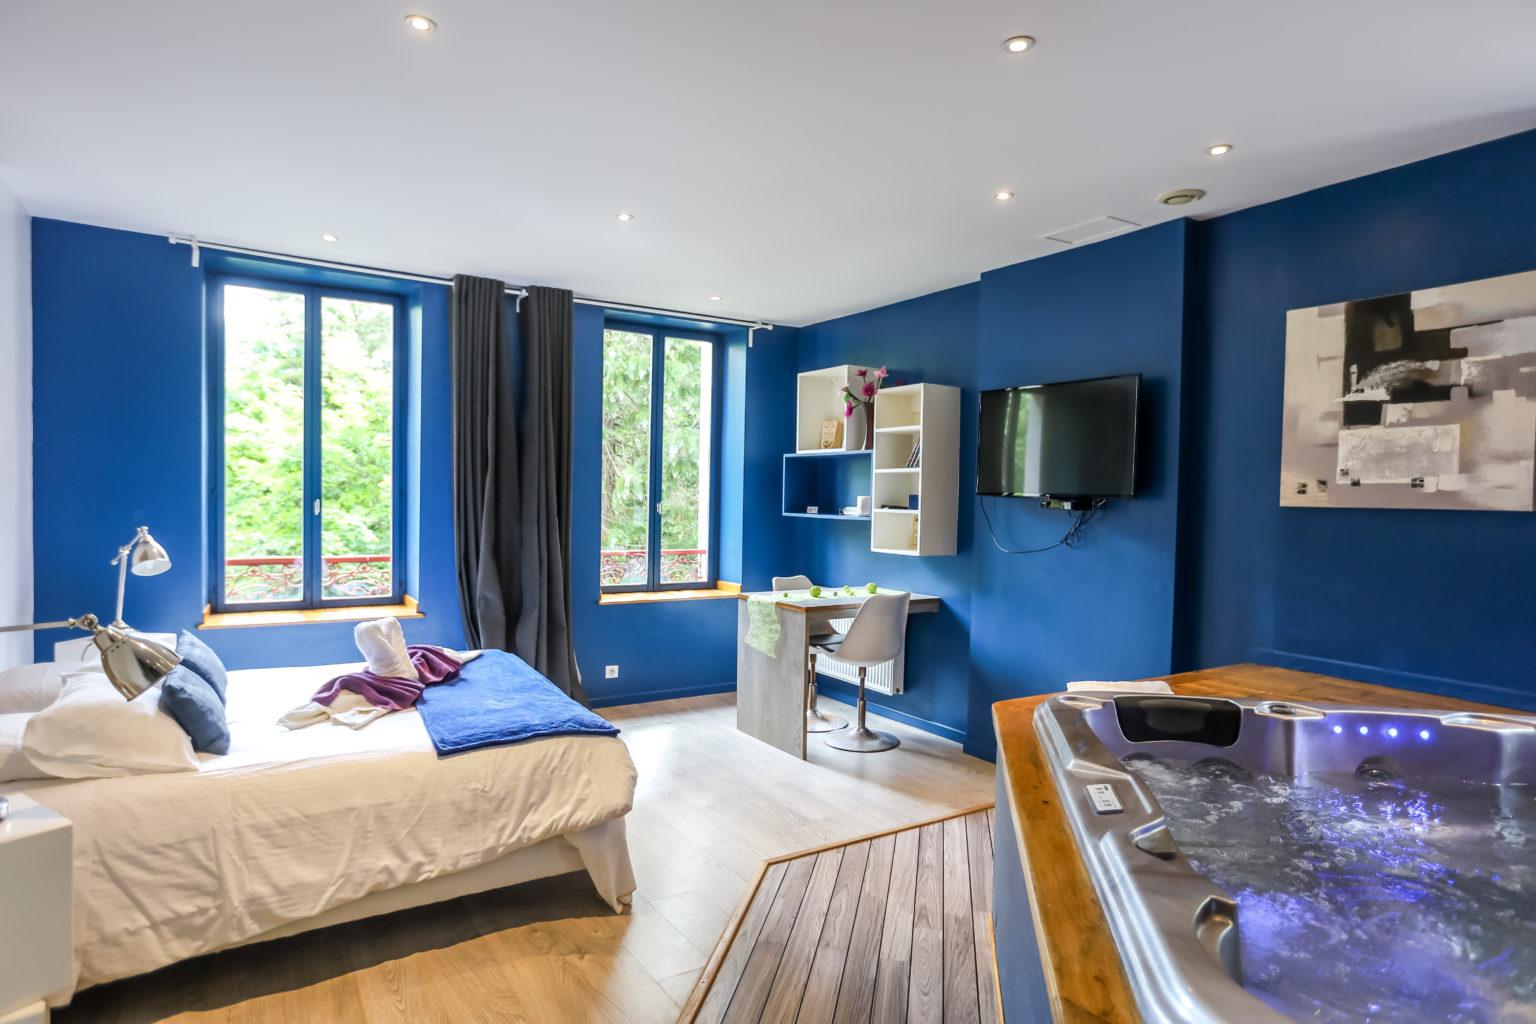 CHAMBRE LA FONTVINEUSE IMG_1603LA FONT VINEUSE HOTEL & SPA